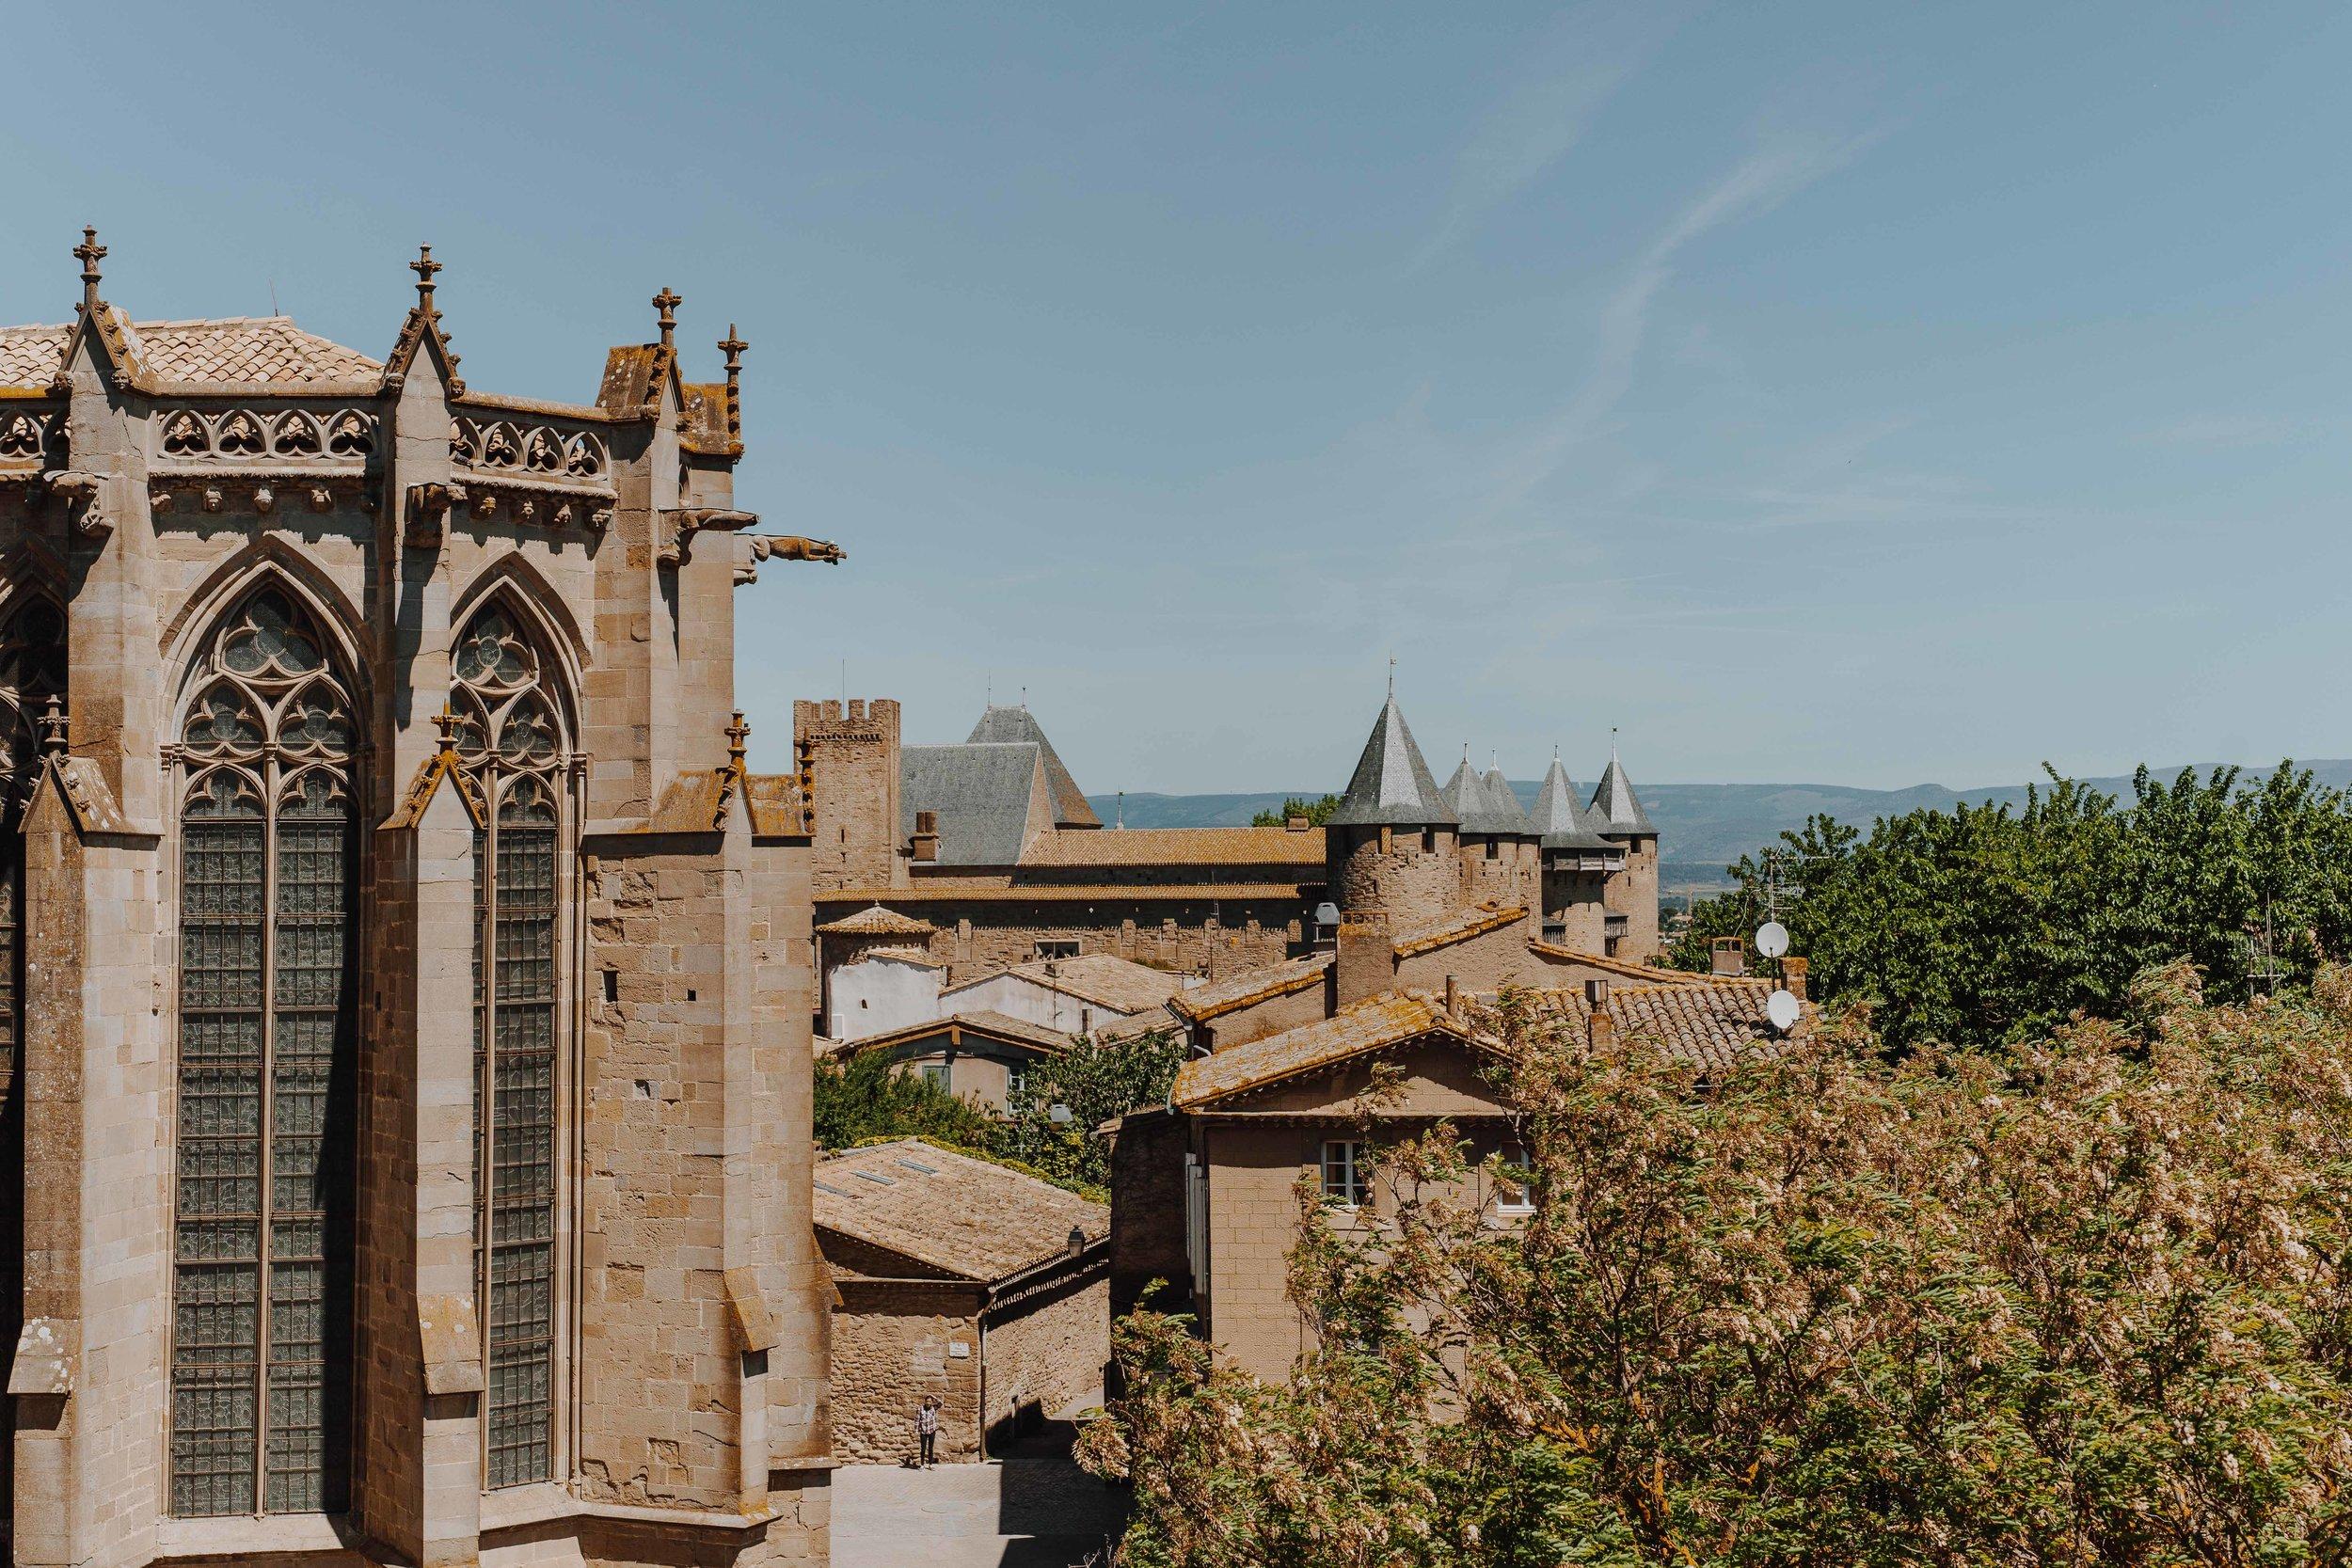 ASROSENVINGE_AtoutFrance_Occitanie_Toulouse_LowRes-236.jpg